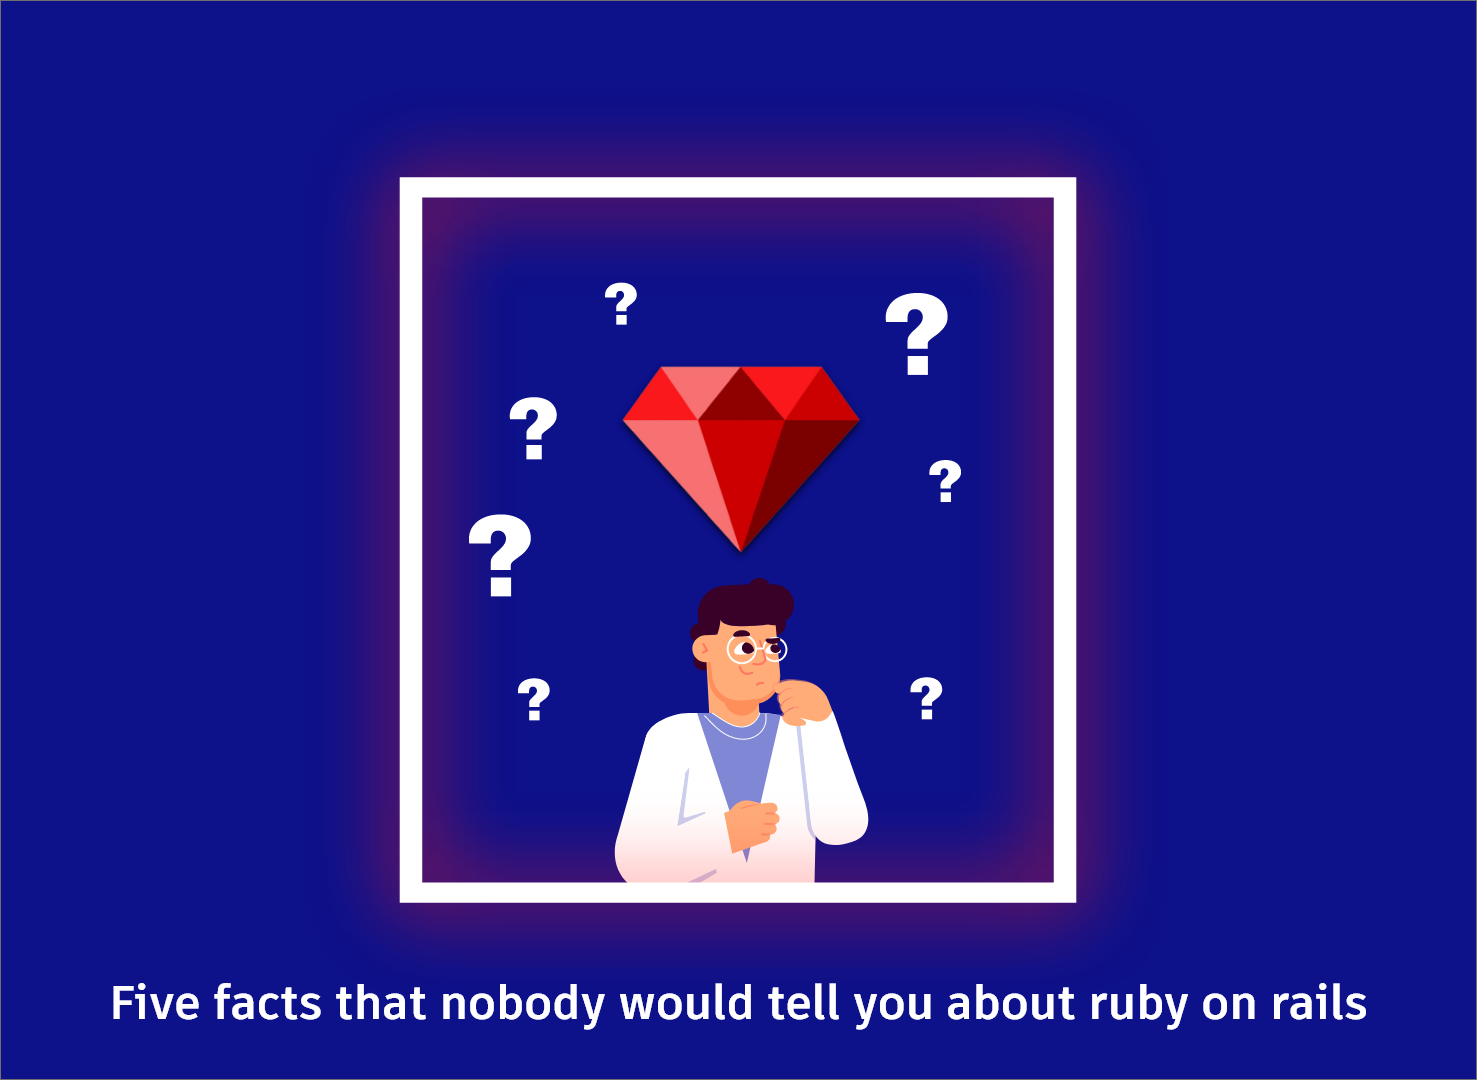 Ruby on rails development service